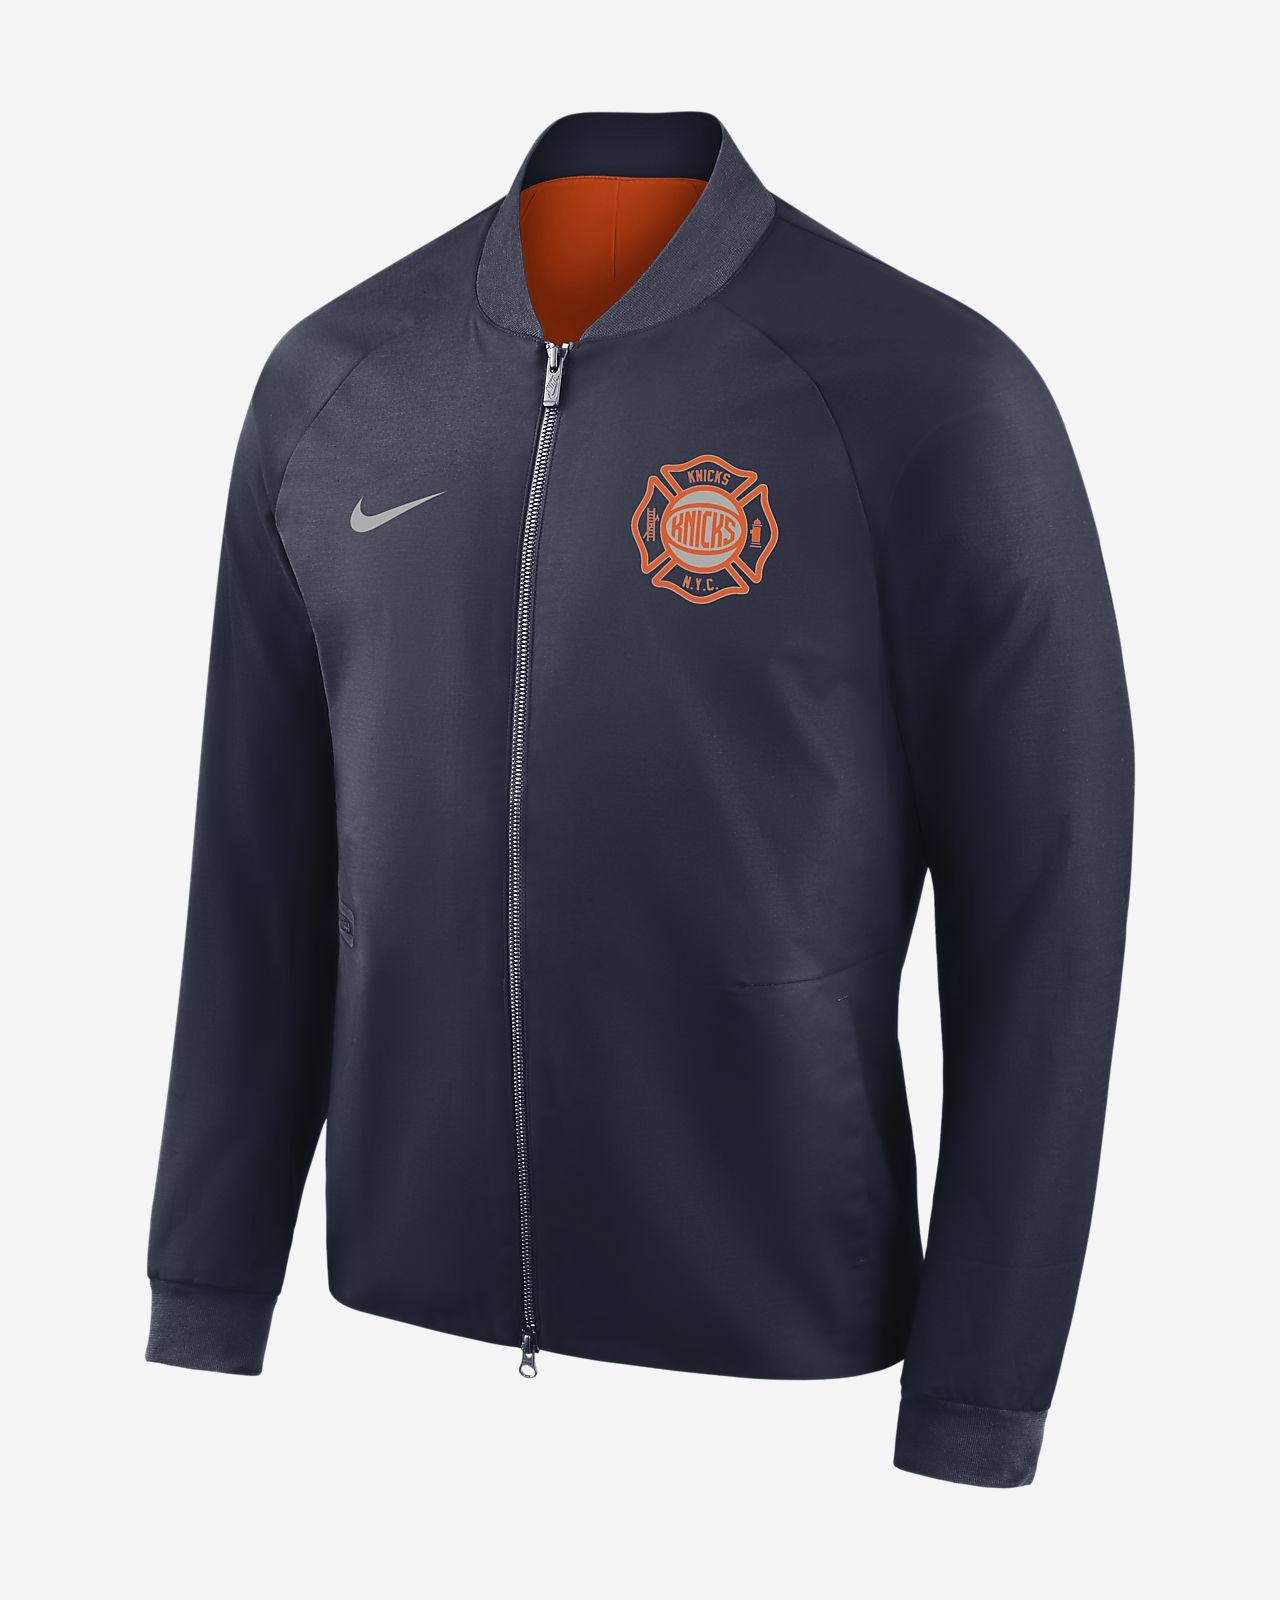 New York Knicks City Edition Nike Modern Men NBA Varsity Jacket